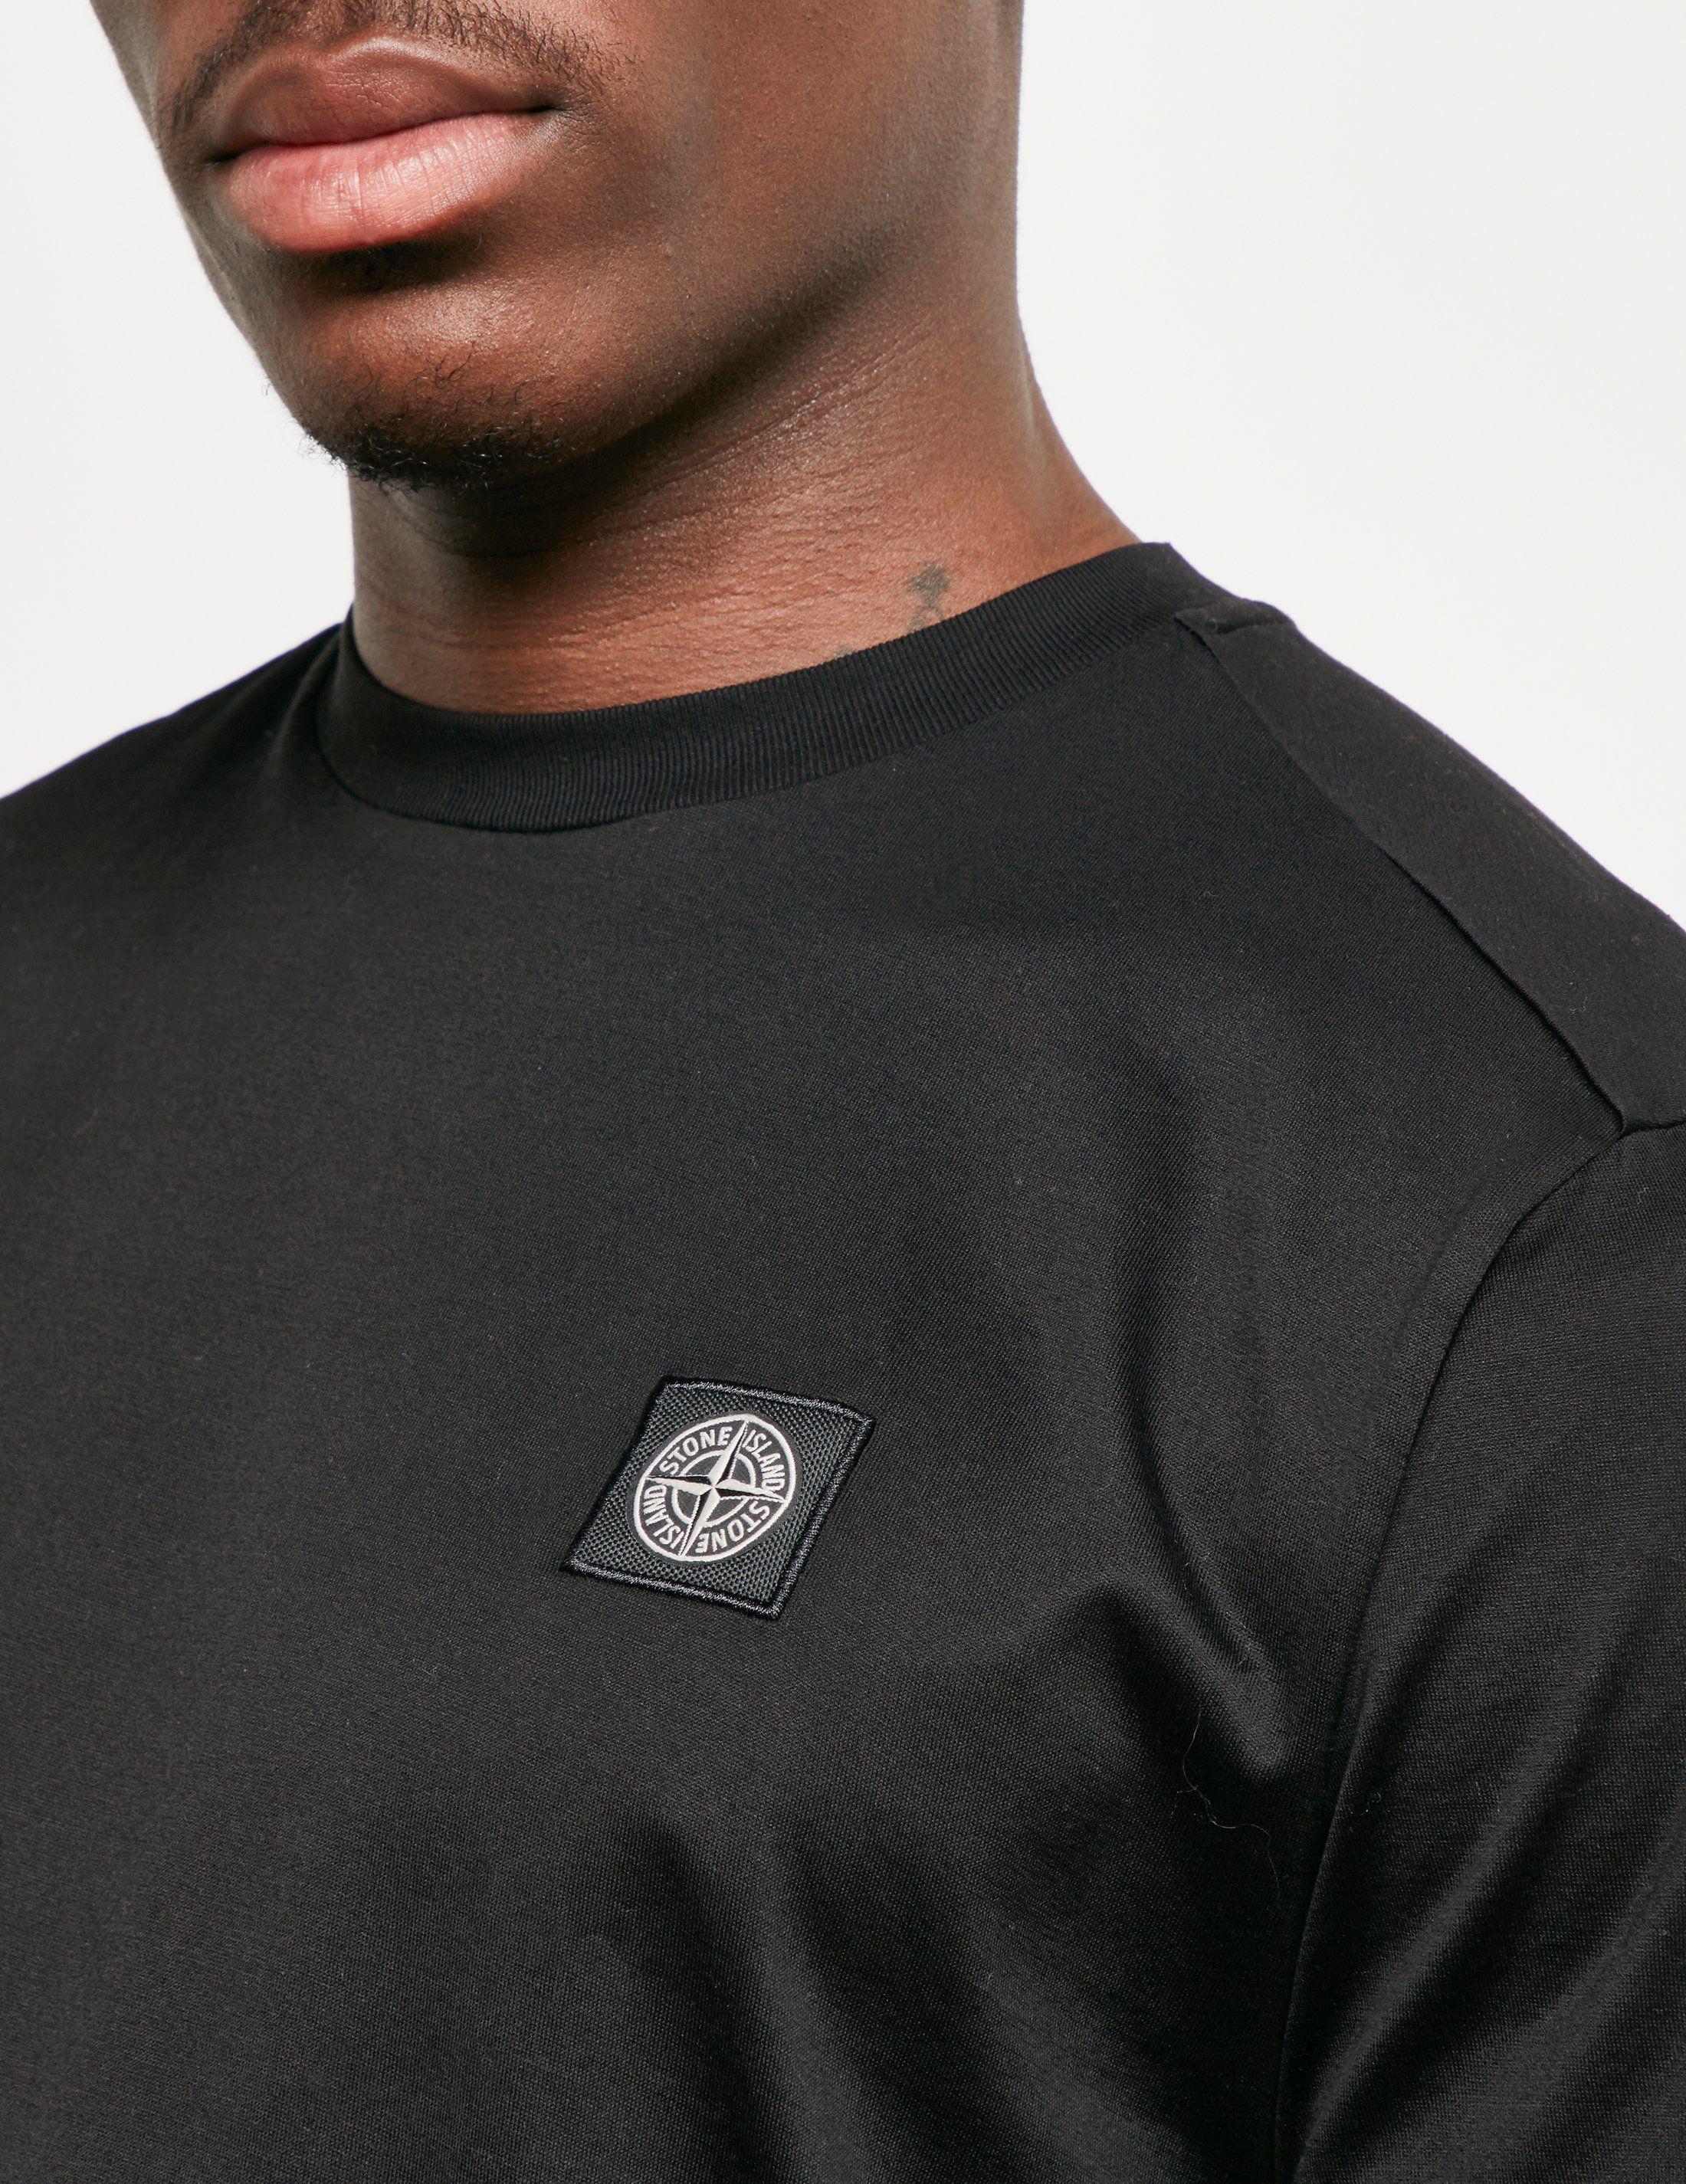 Stone Island Patch Short Sleeve T-Shirt